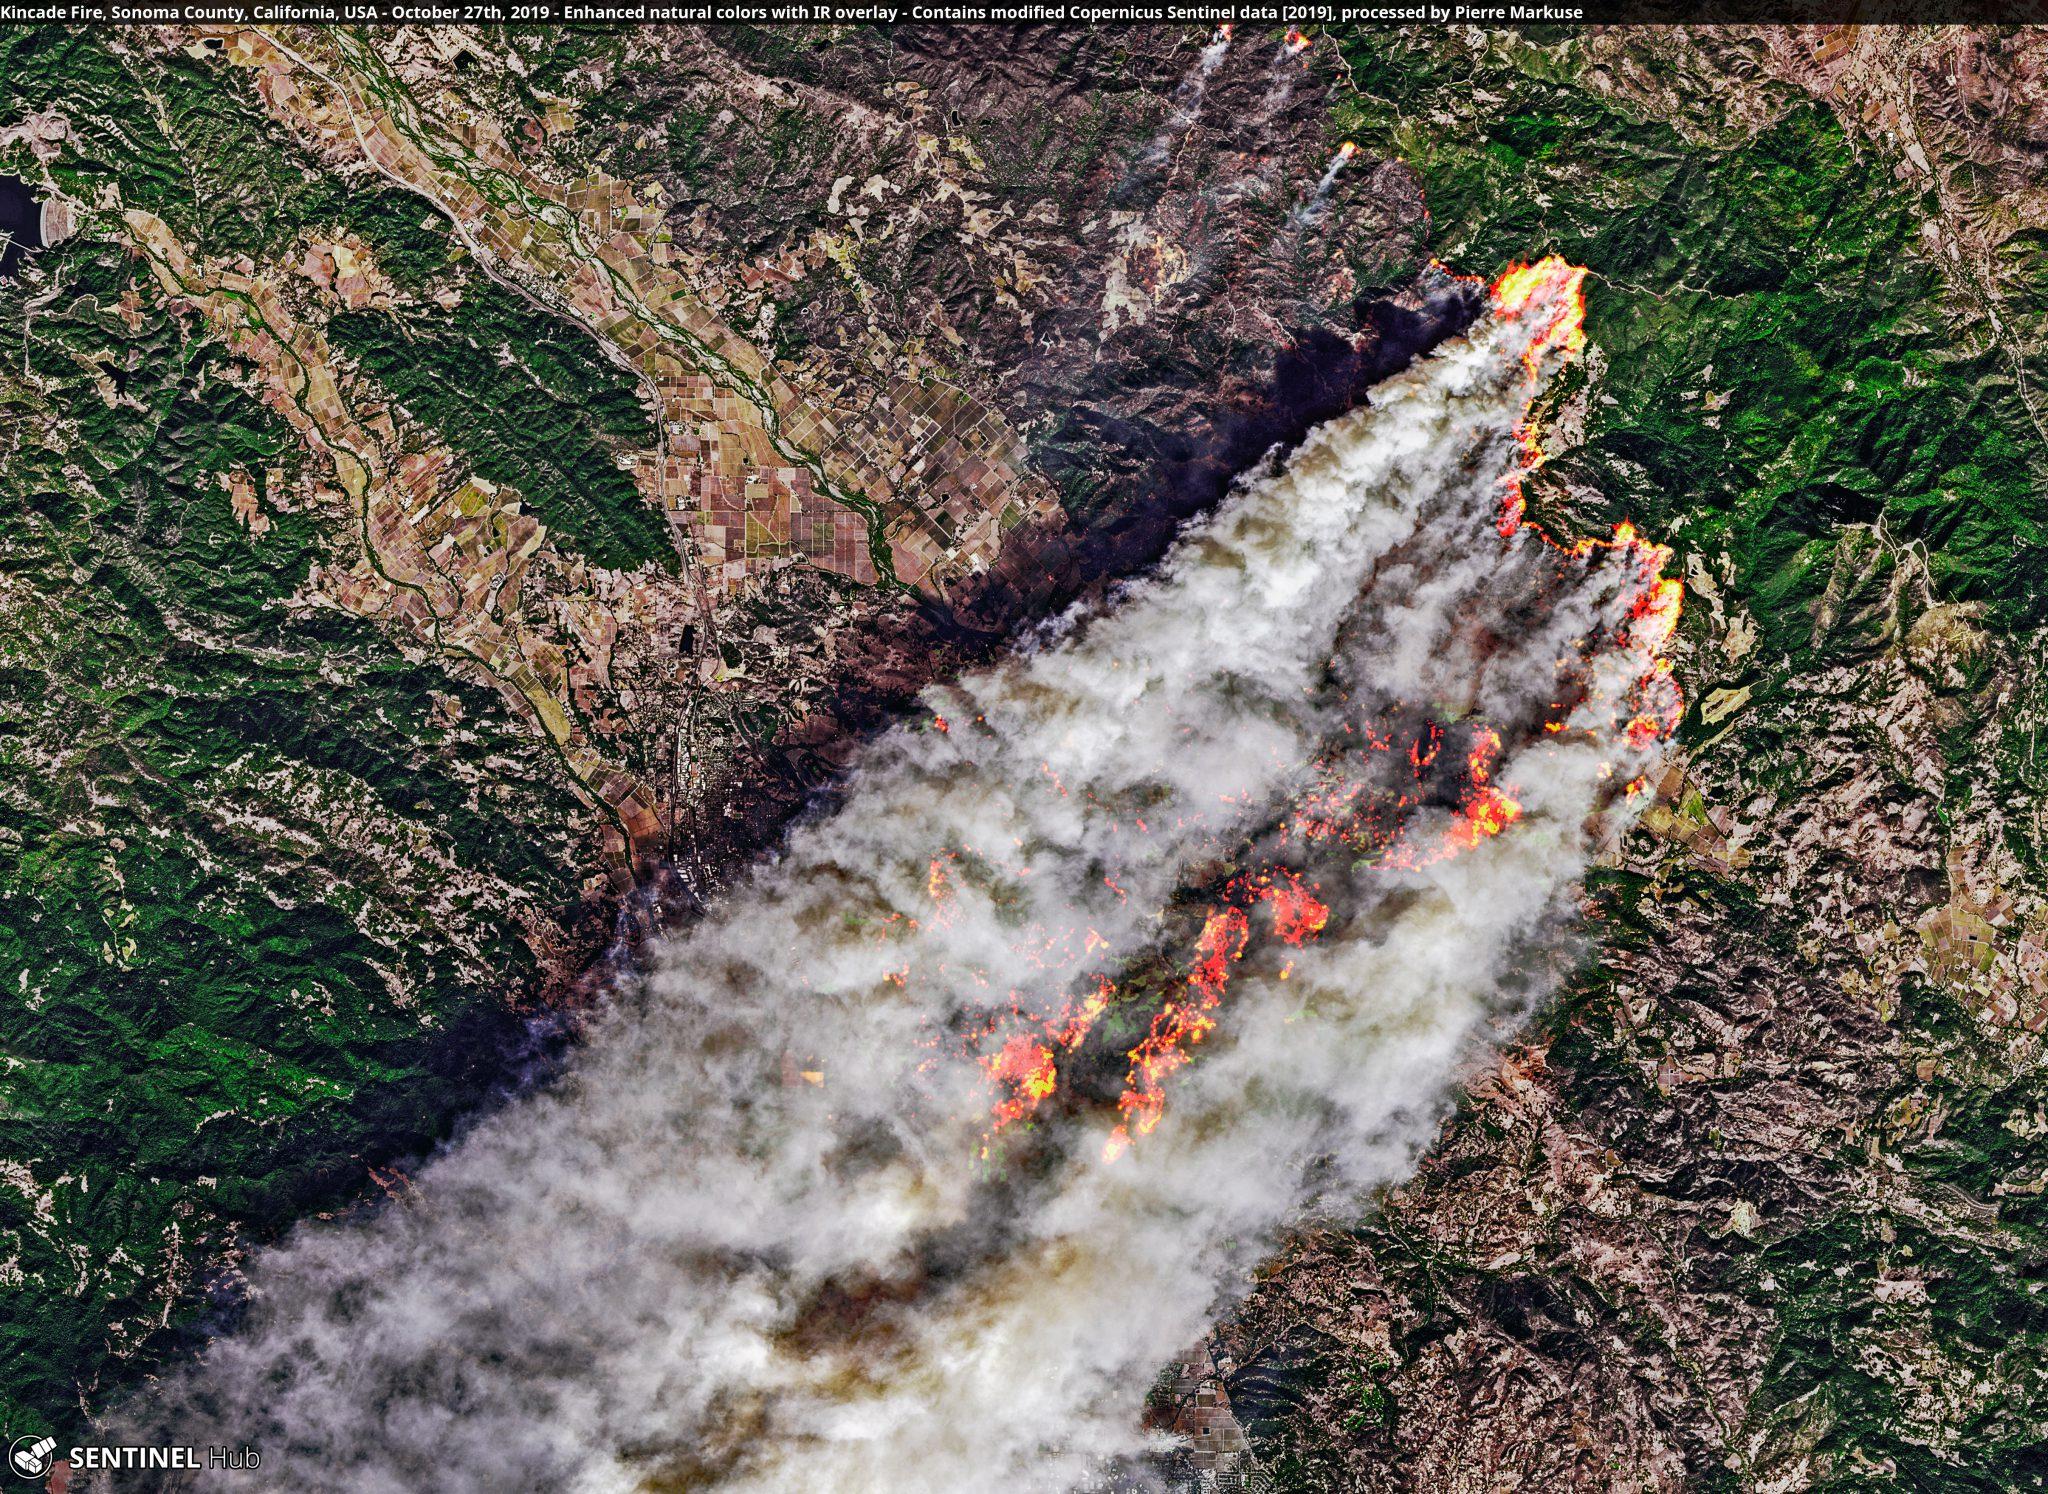 desc:Kincade Fire, Sonoma County, California, USA - October 27th, 2019 Copernicus/Pierre Markuse